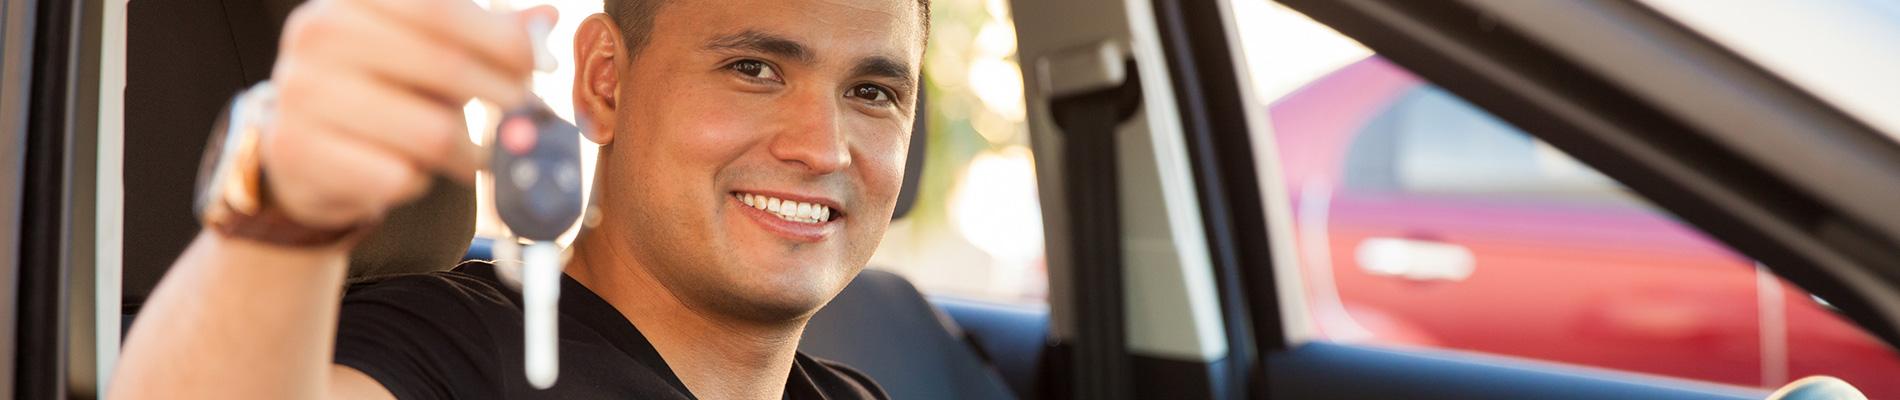 Peachstate Auto Insurance >> Peachstate Insurance - Auto Insurance - Atlanta, GA